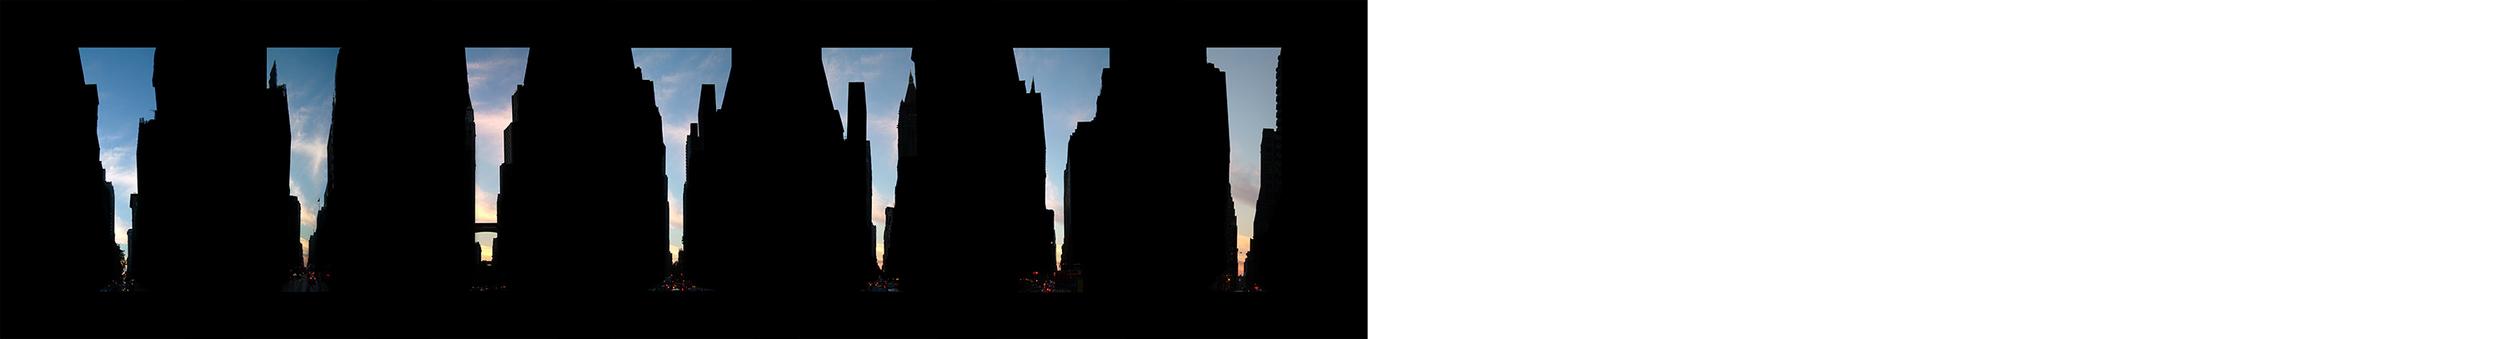 "22nd - 28th Streets   , 7c-prints 7 x 5"" each, 2004"